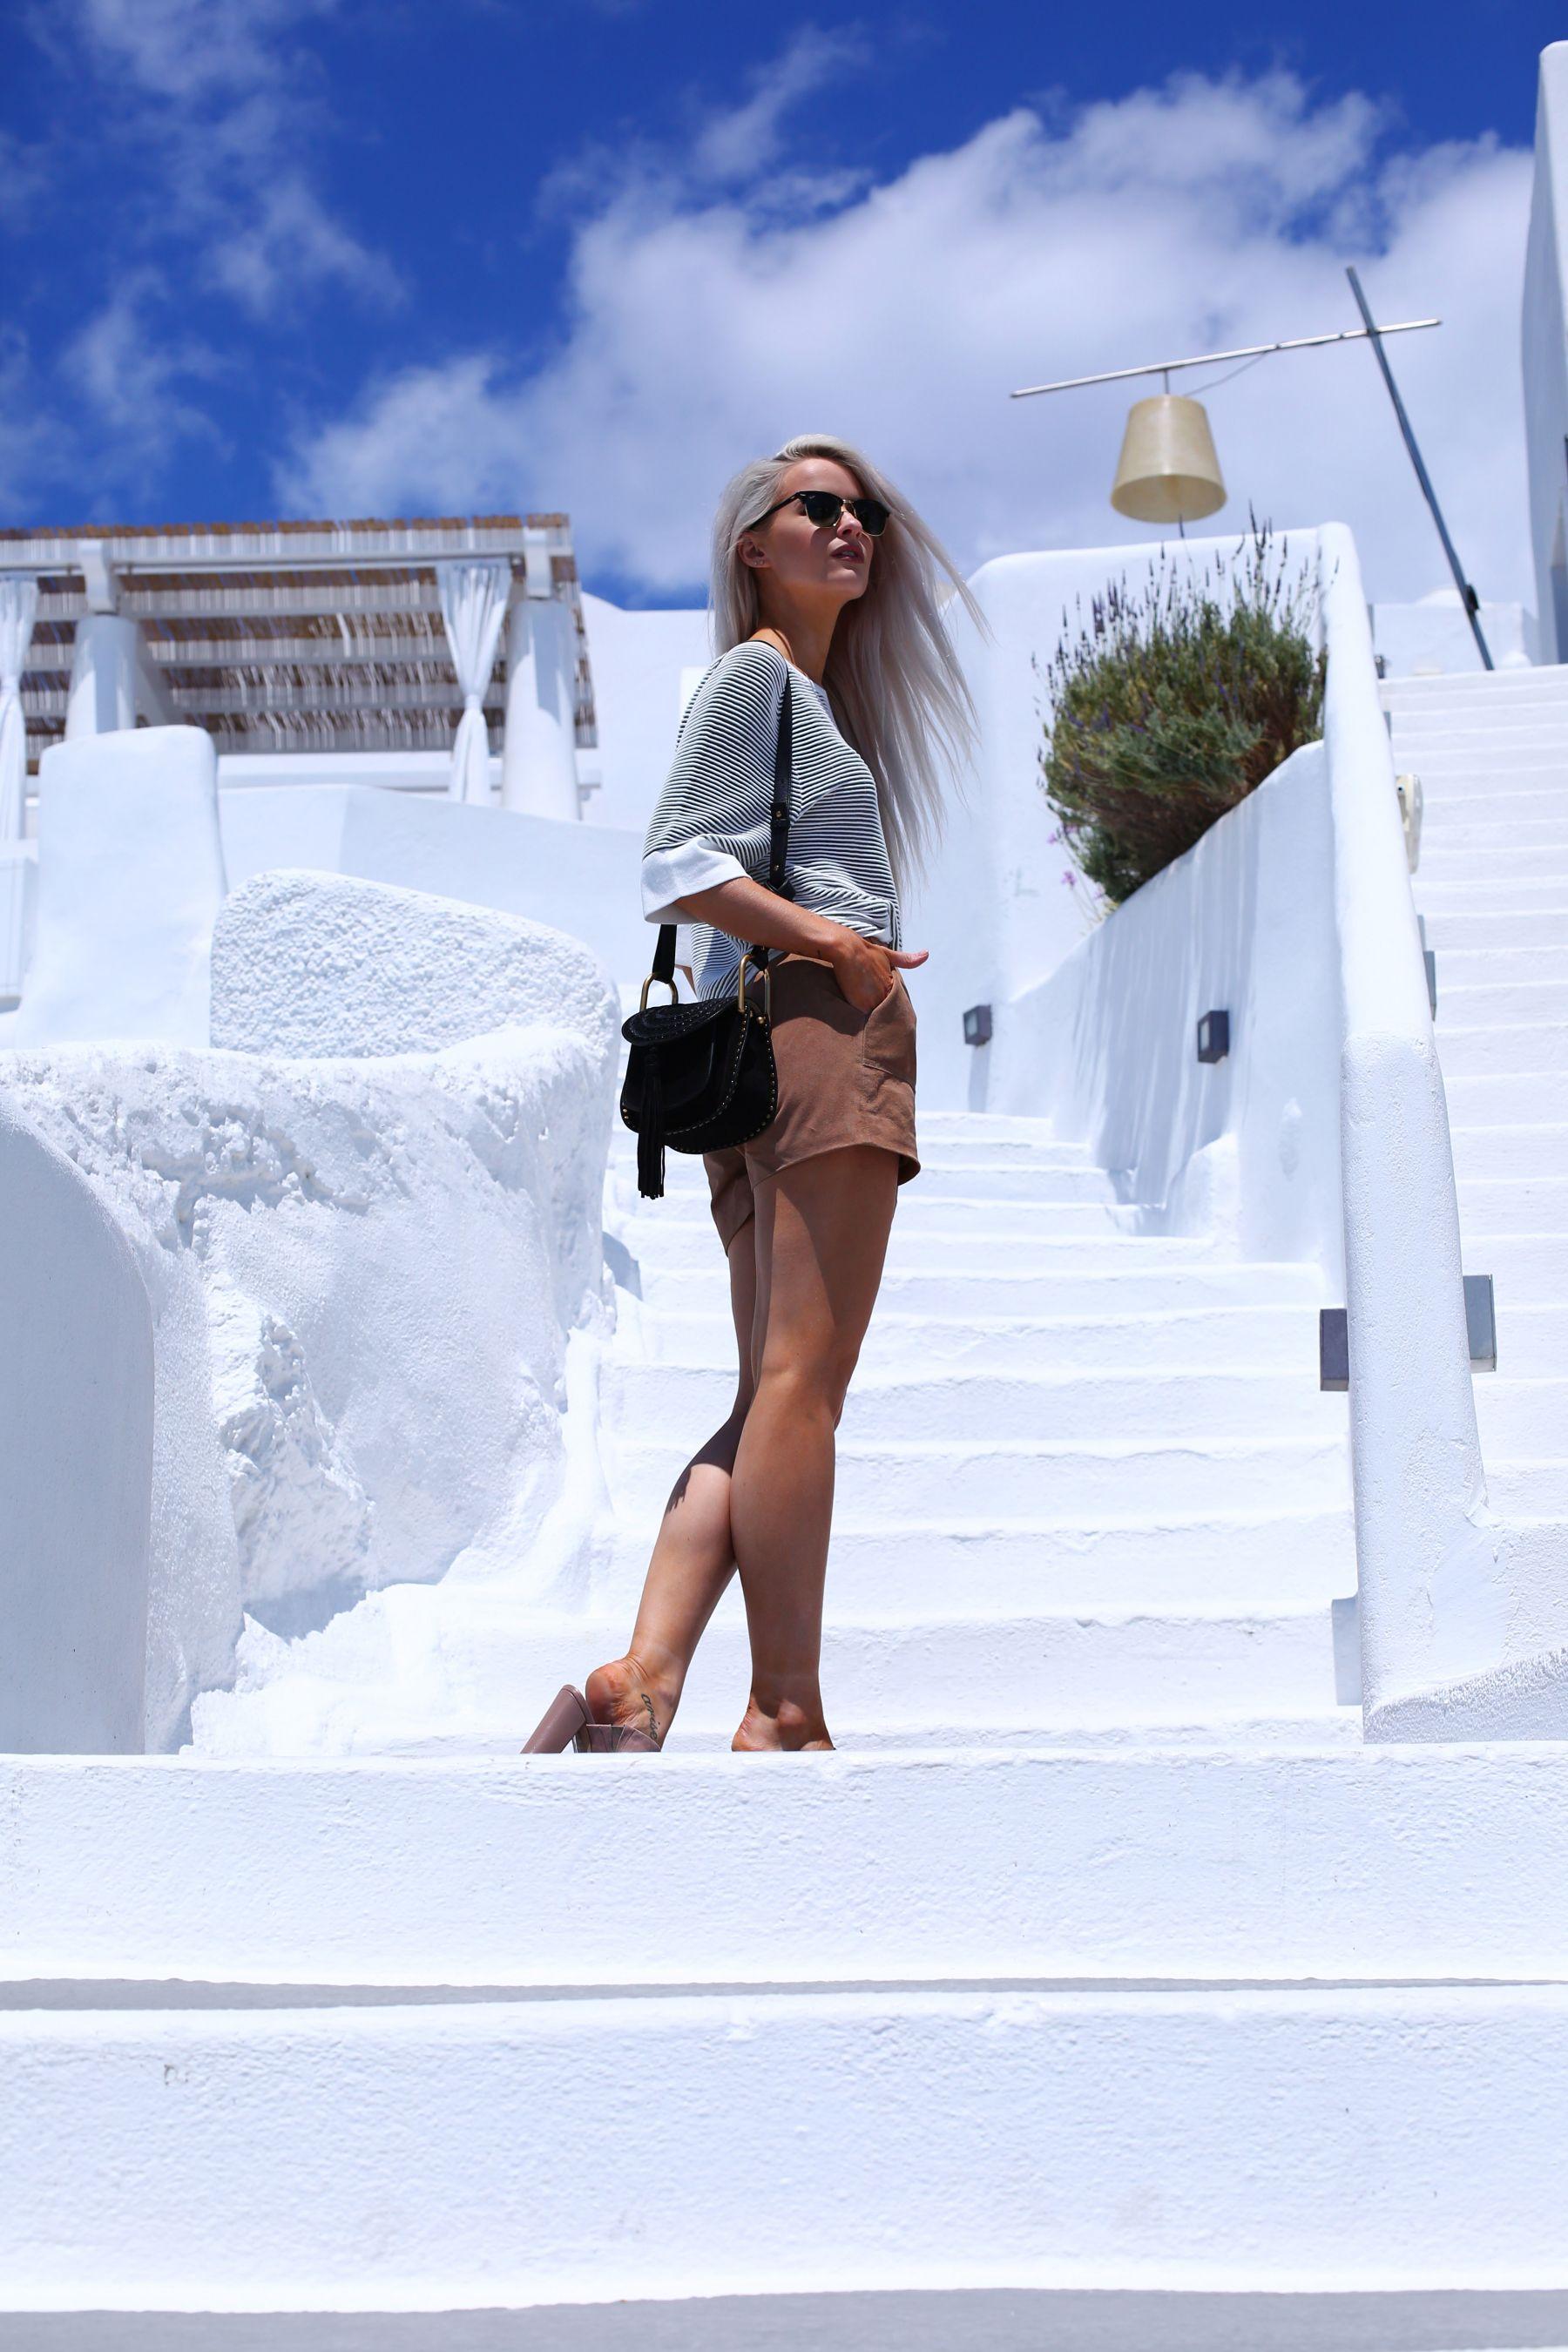 Santorini Reiss Outfits: Bikini Daytime to Evening / Inthefrow